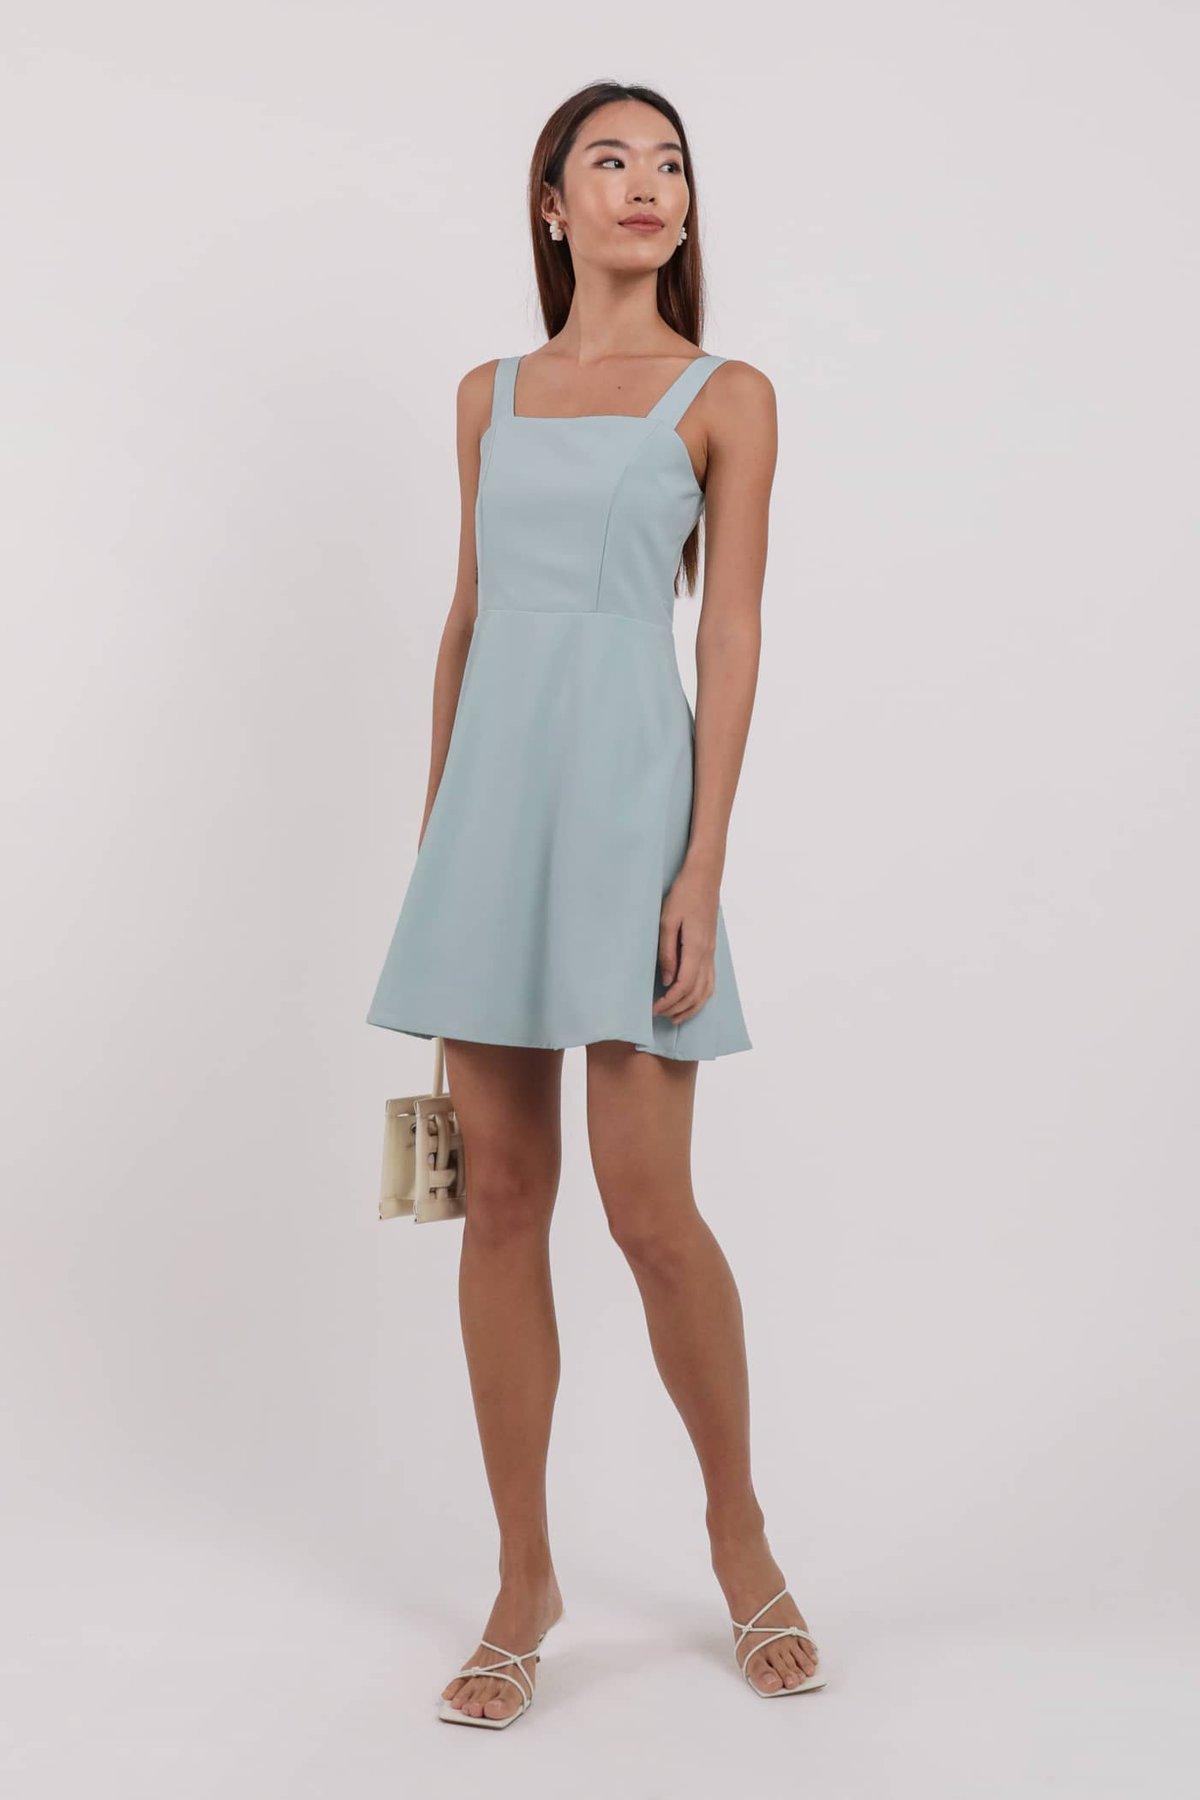 Alexia Flare Dress (Tiffany Blue)